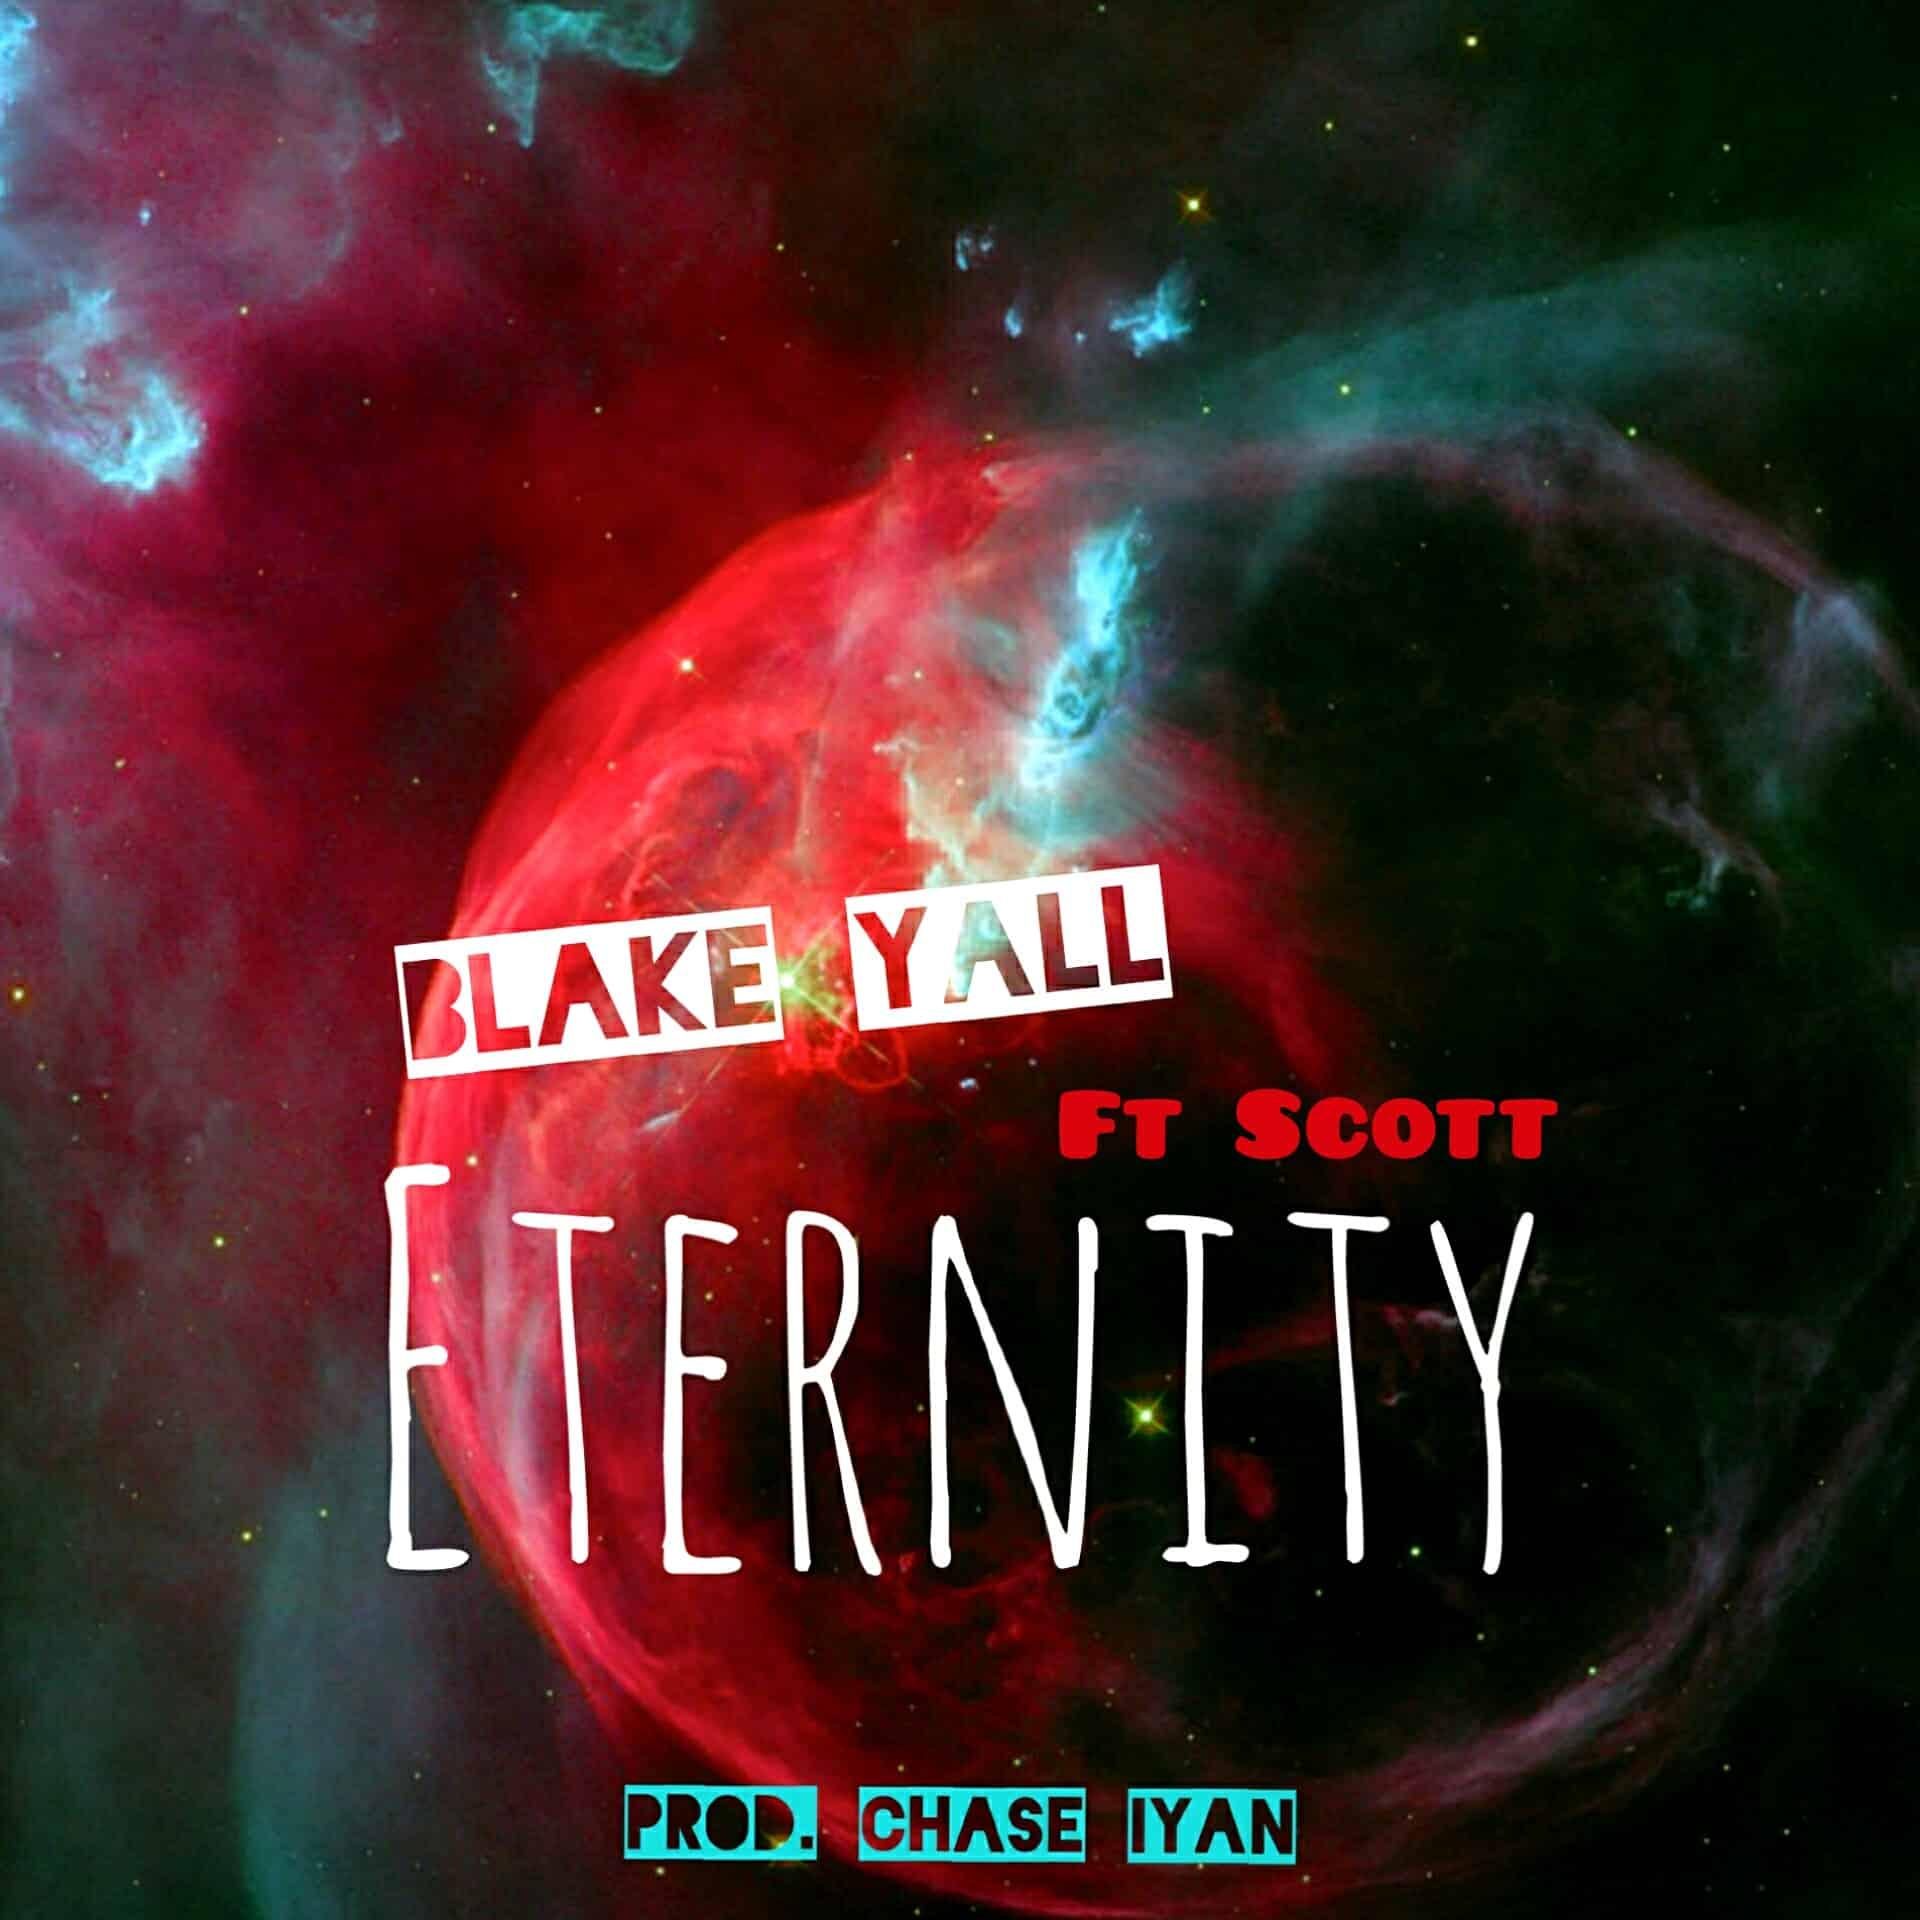 Blake Yall Ft. Scott Eternity